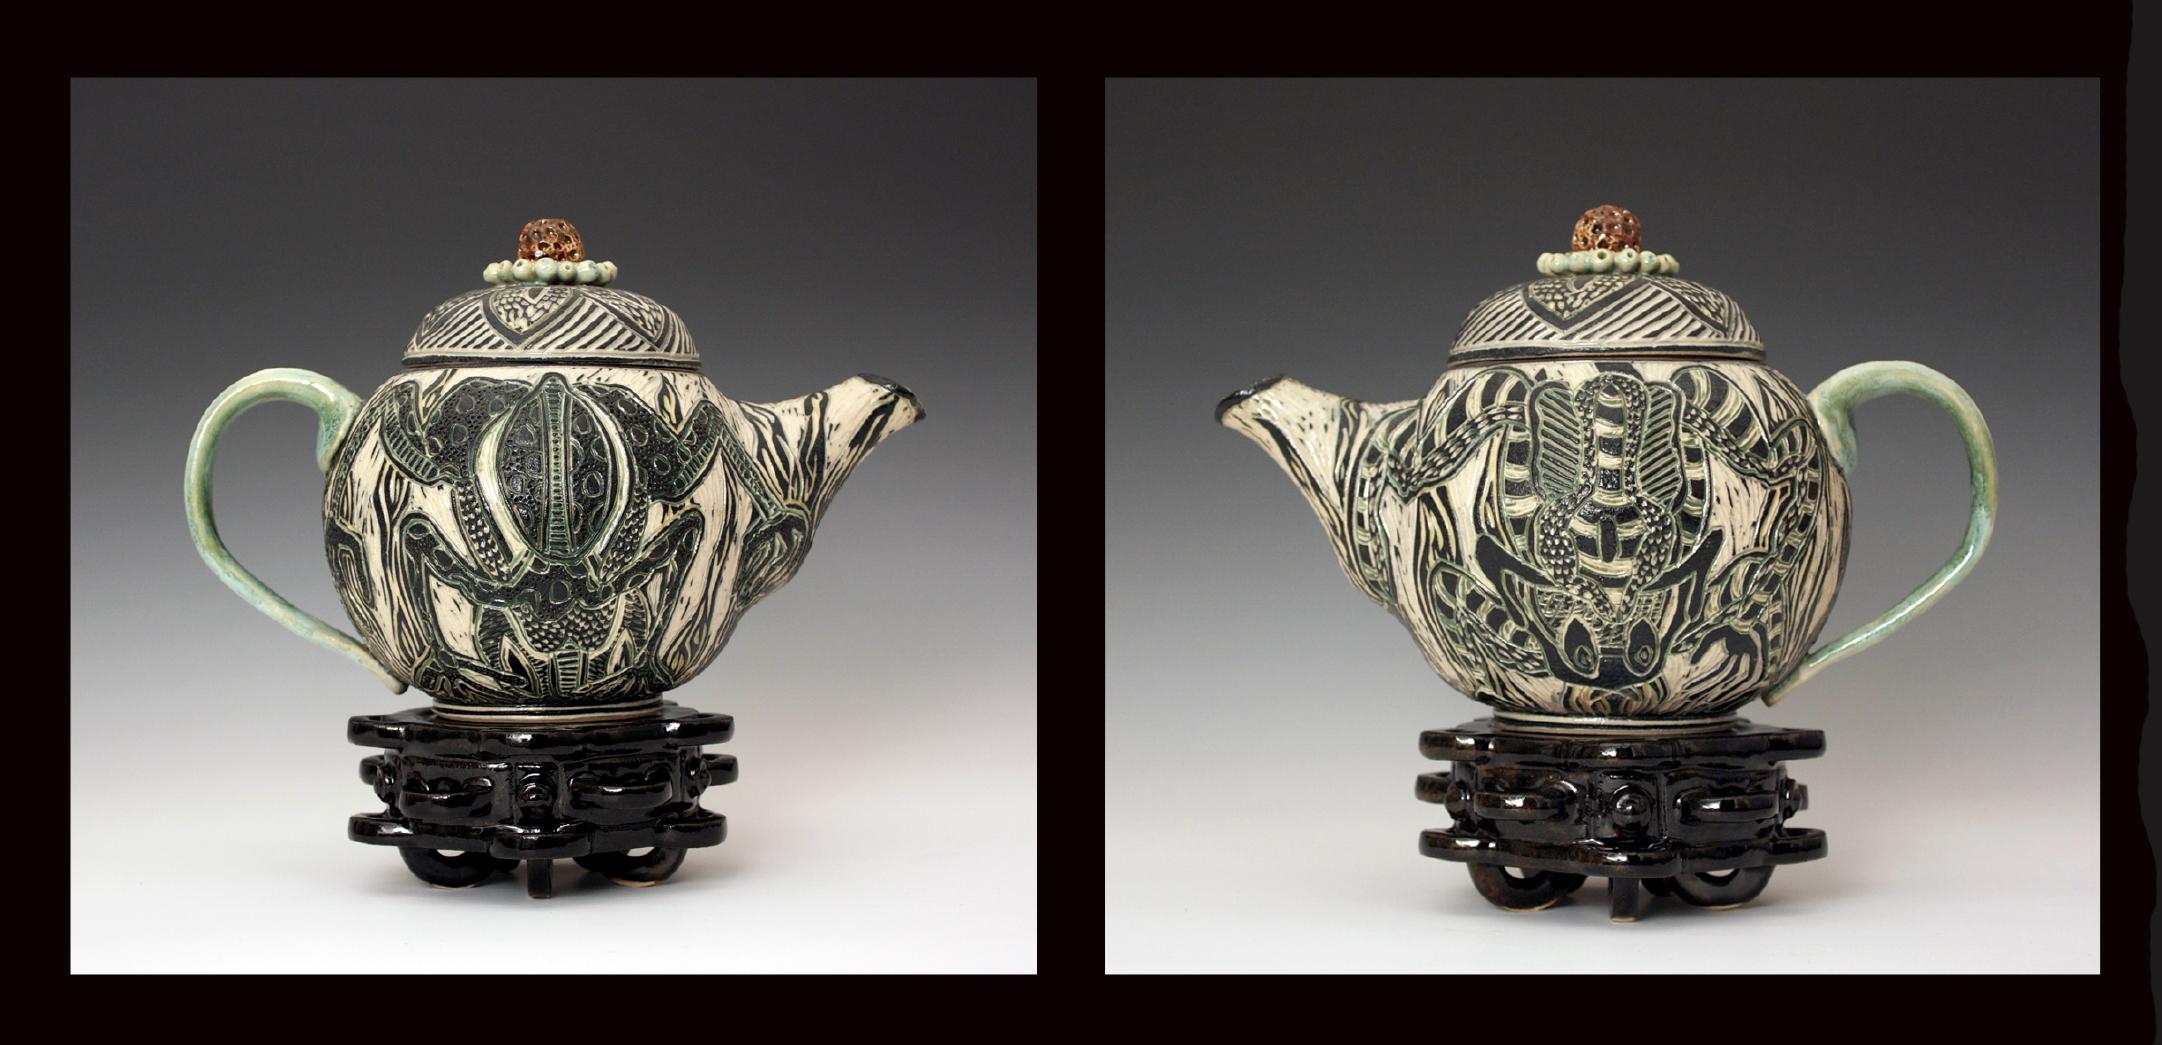 Frog Teapot 2013